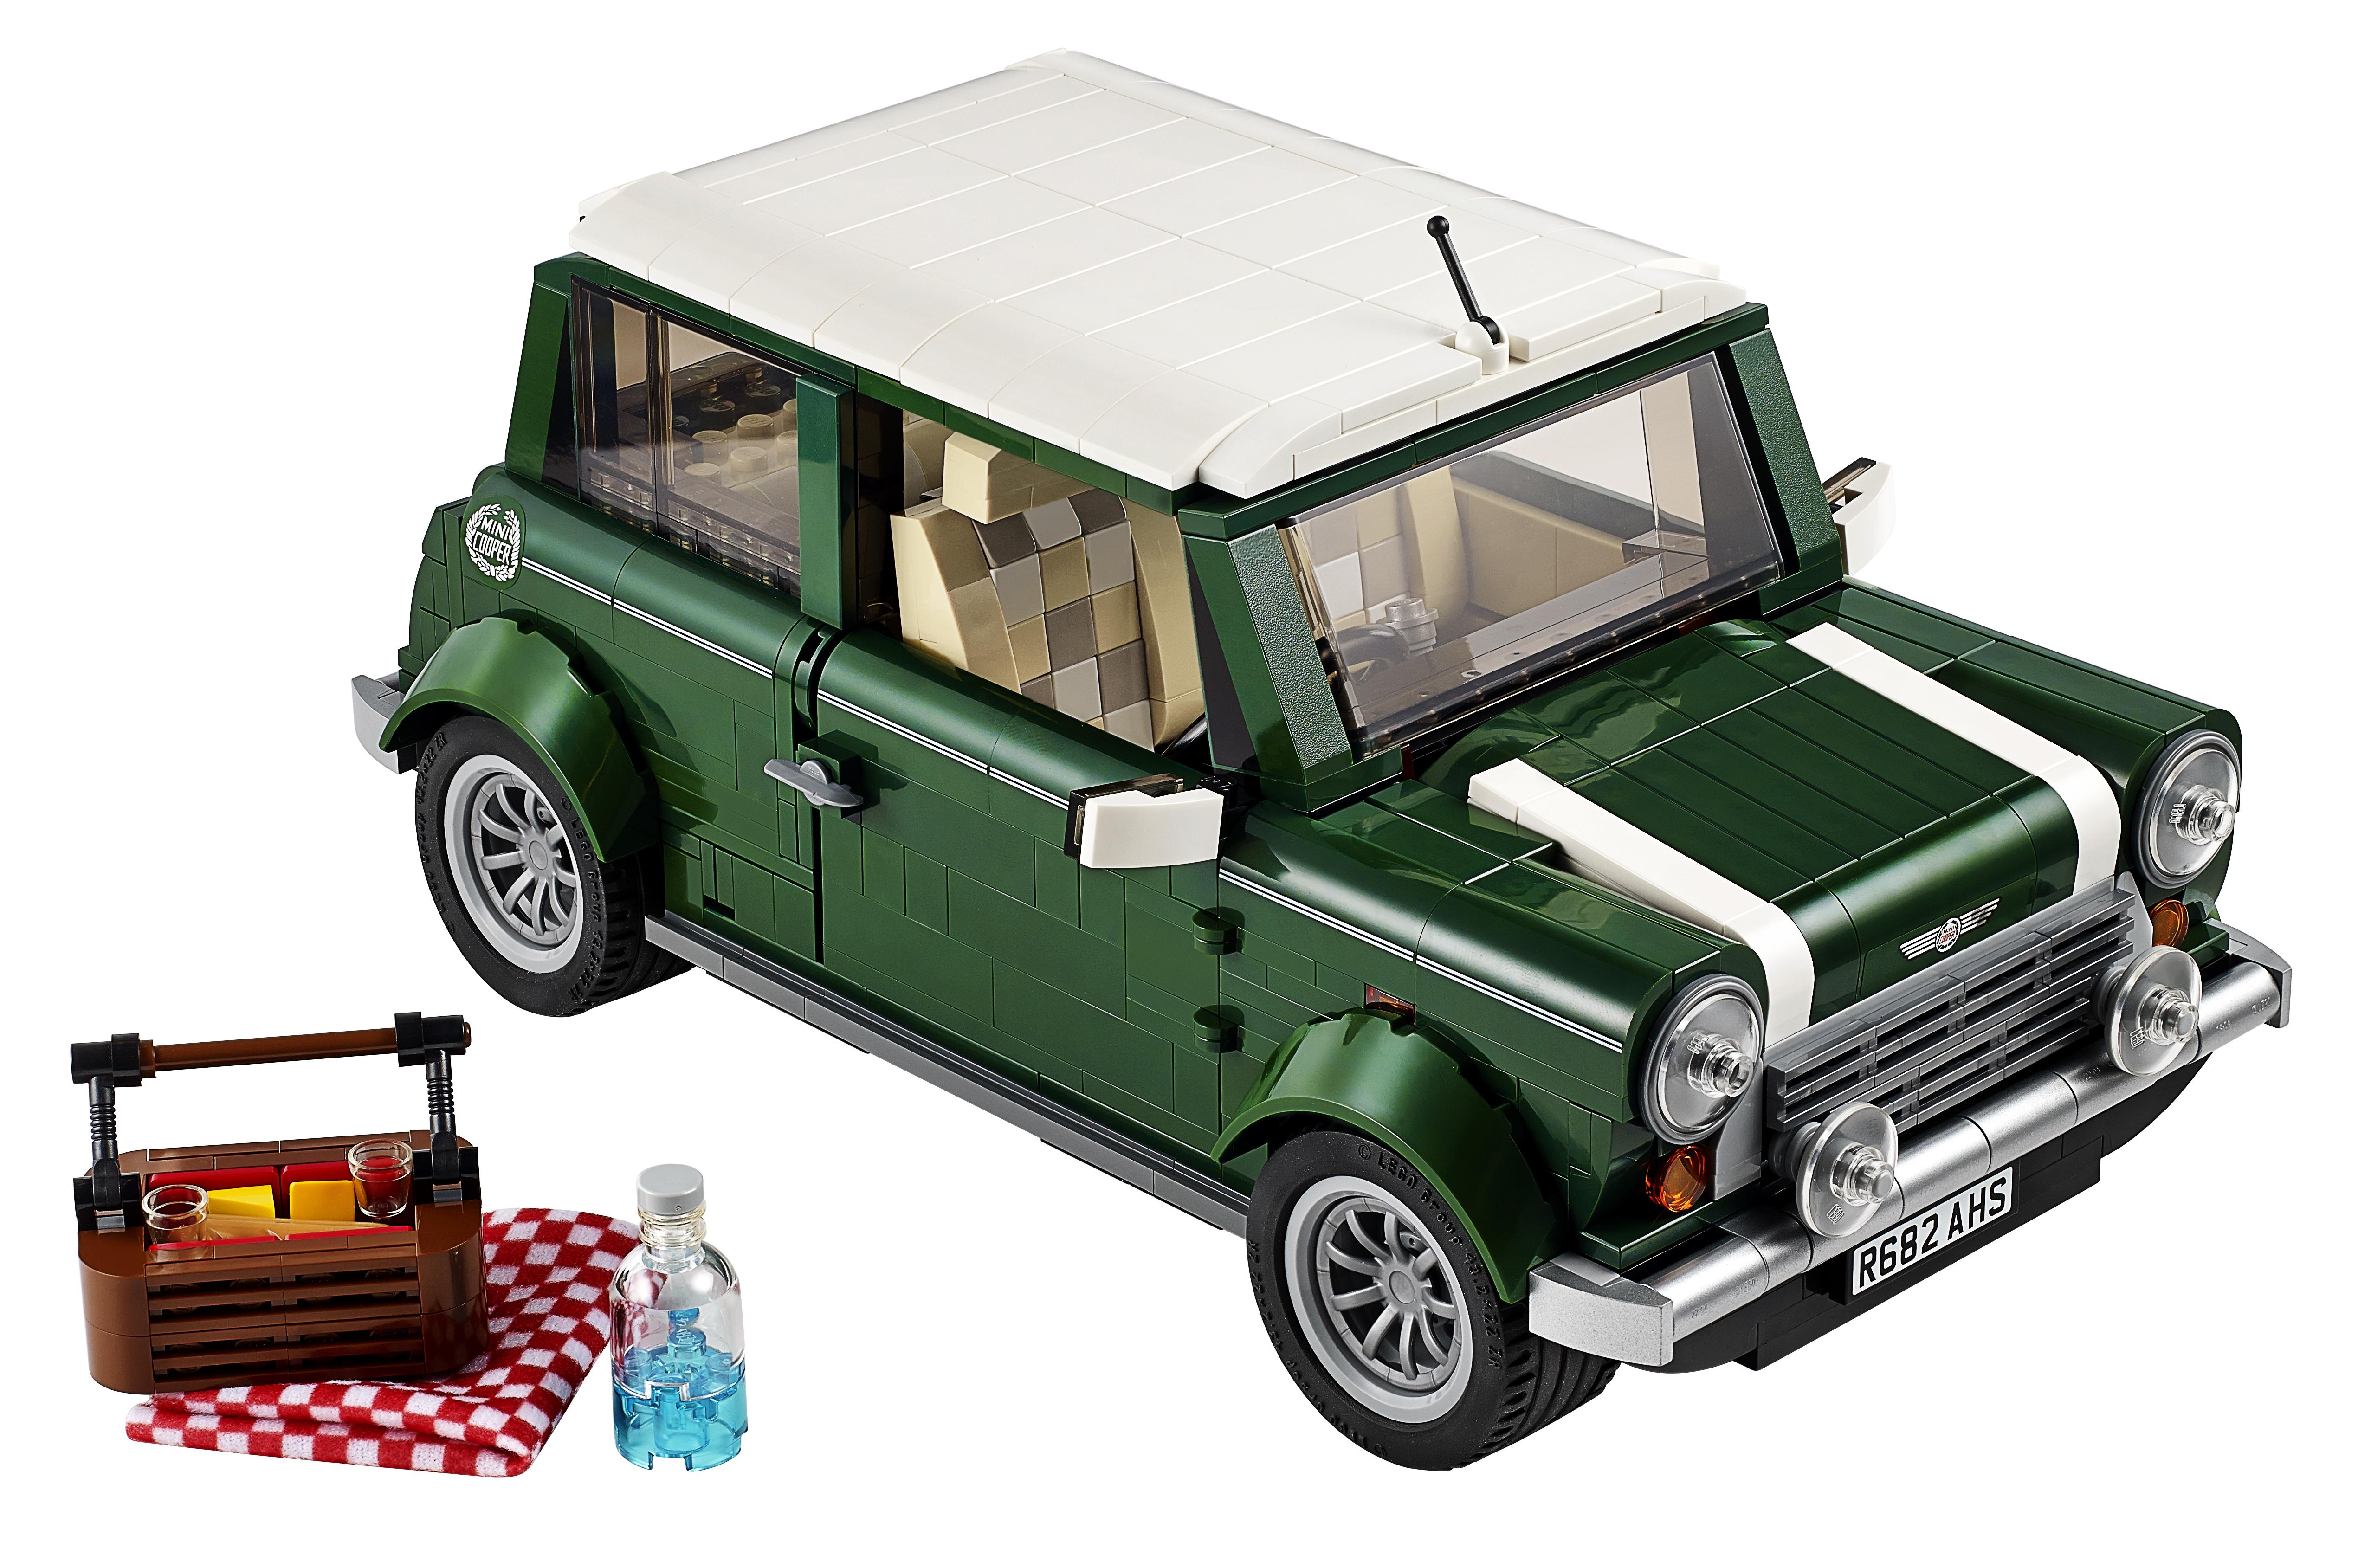 lego camera shots mini brandology jcw adventures. Black Bedroom Furniture Sets. Home Design Ideas